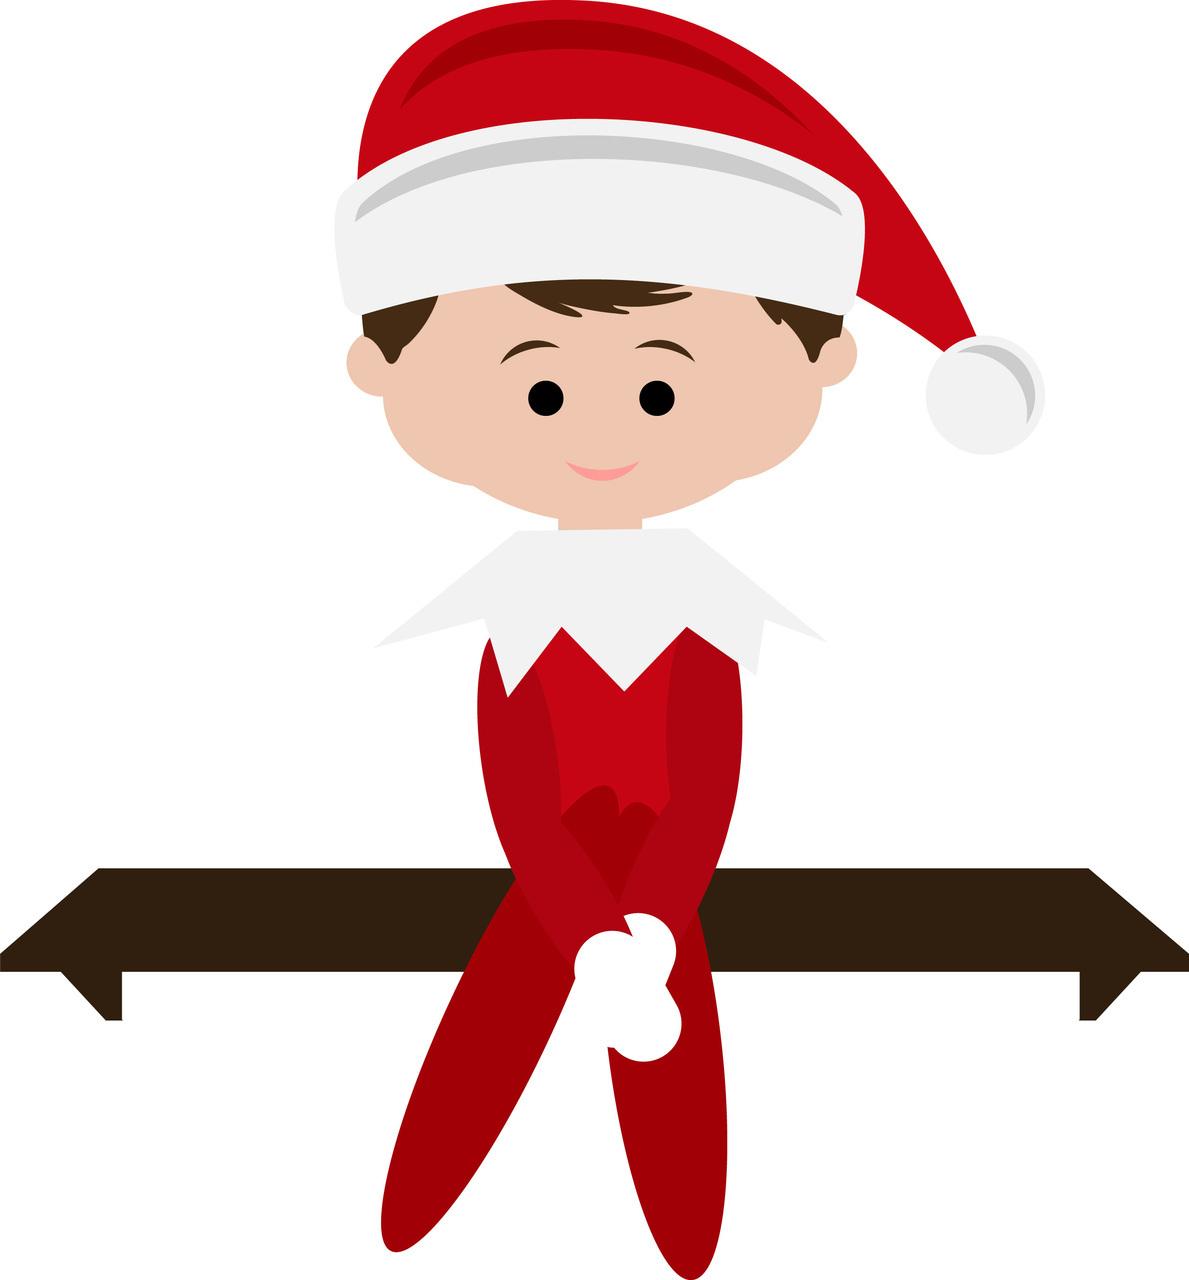 Sad elf clipart banner free stock Free Sad Elves Cliparts, Download Free Clip Art, Free Clip ... banner free stock